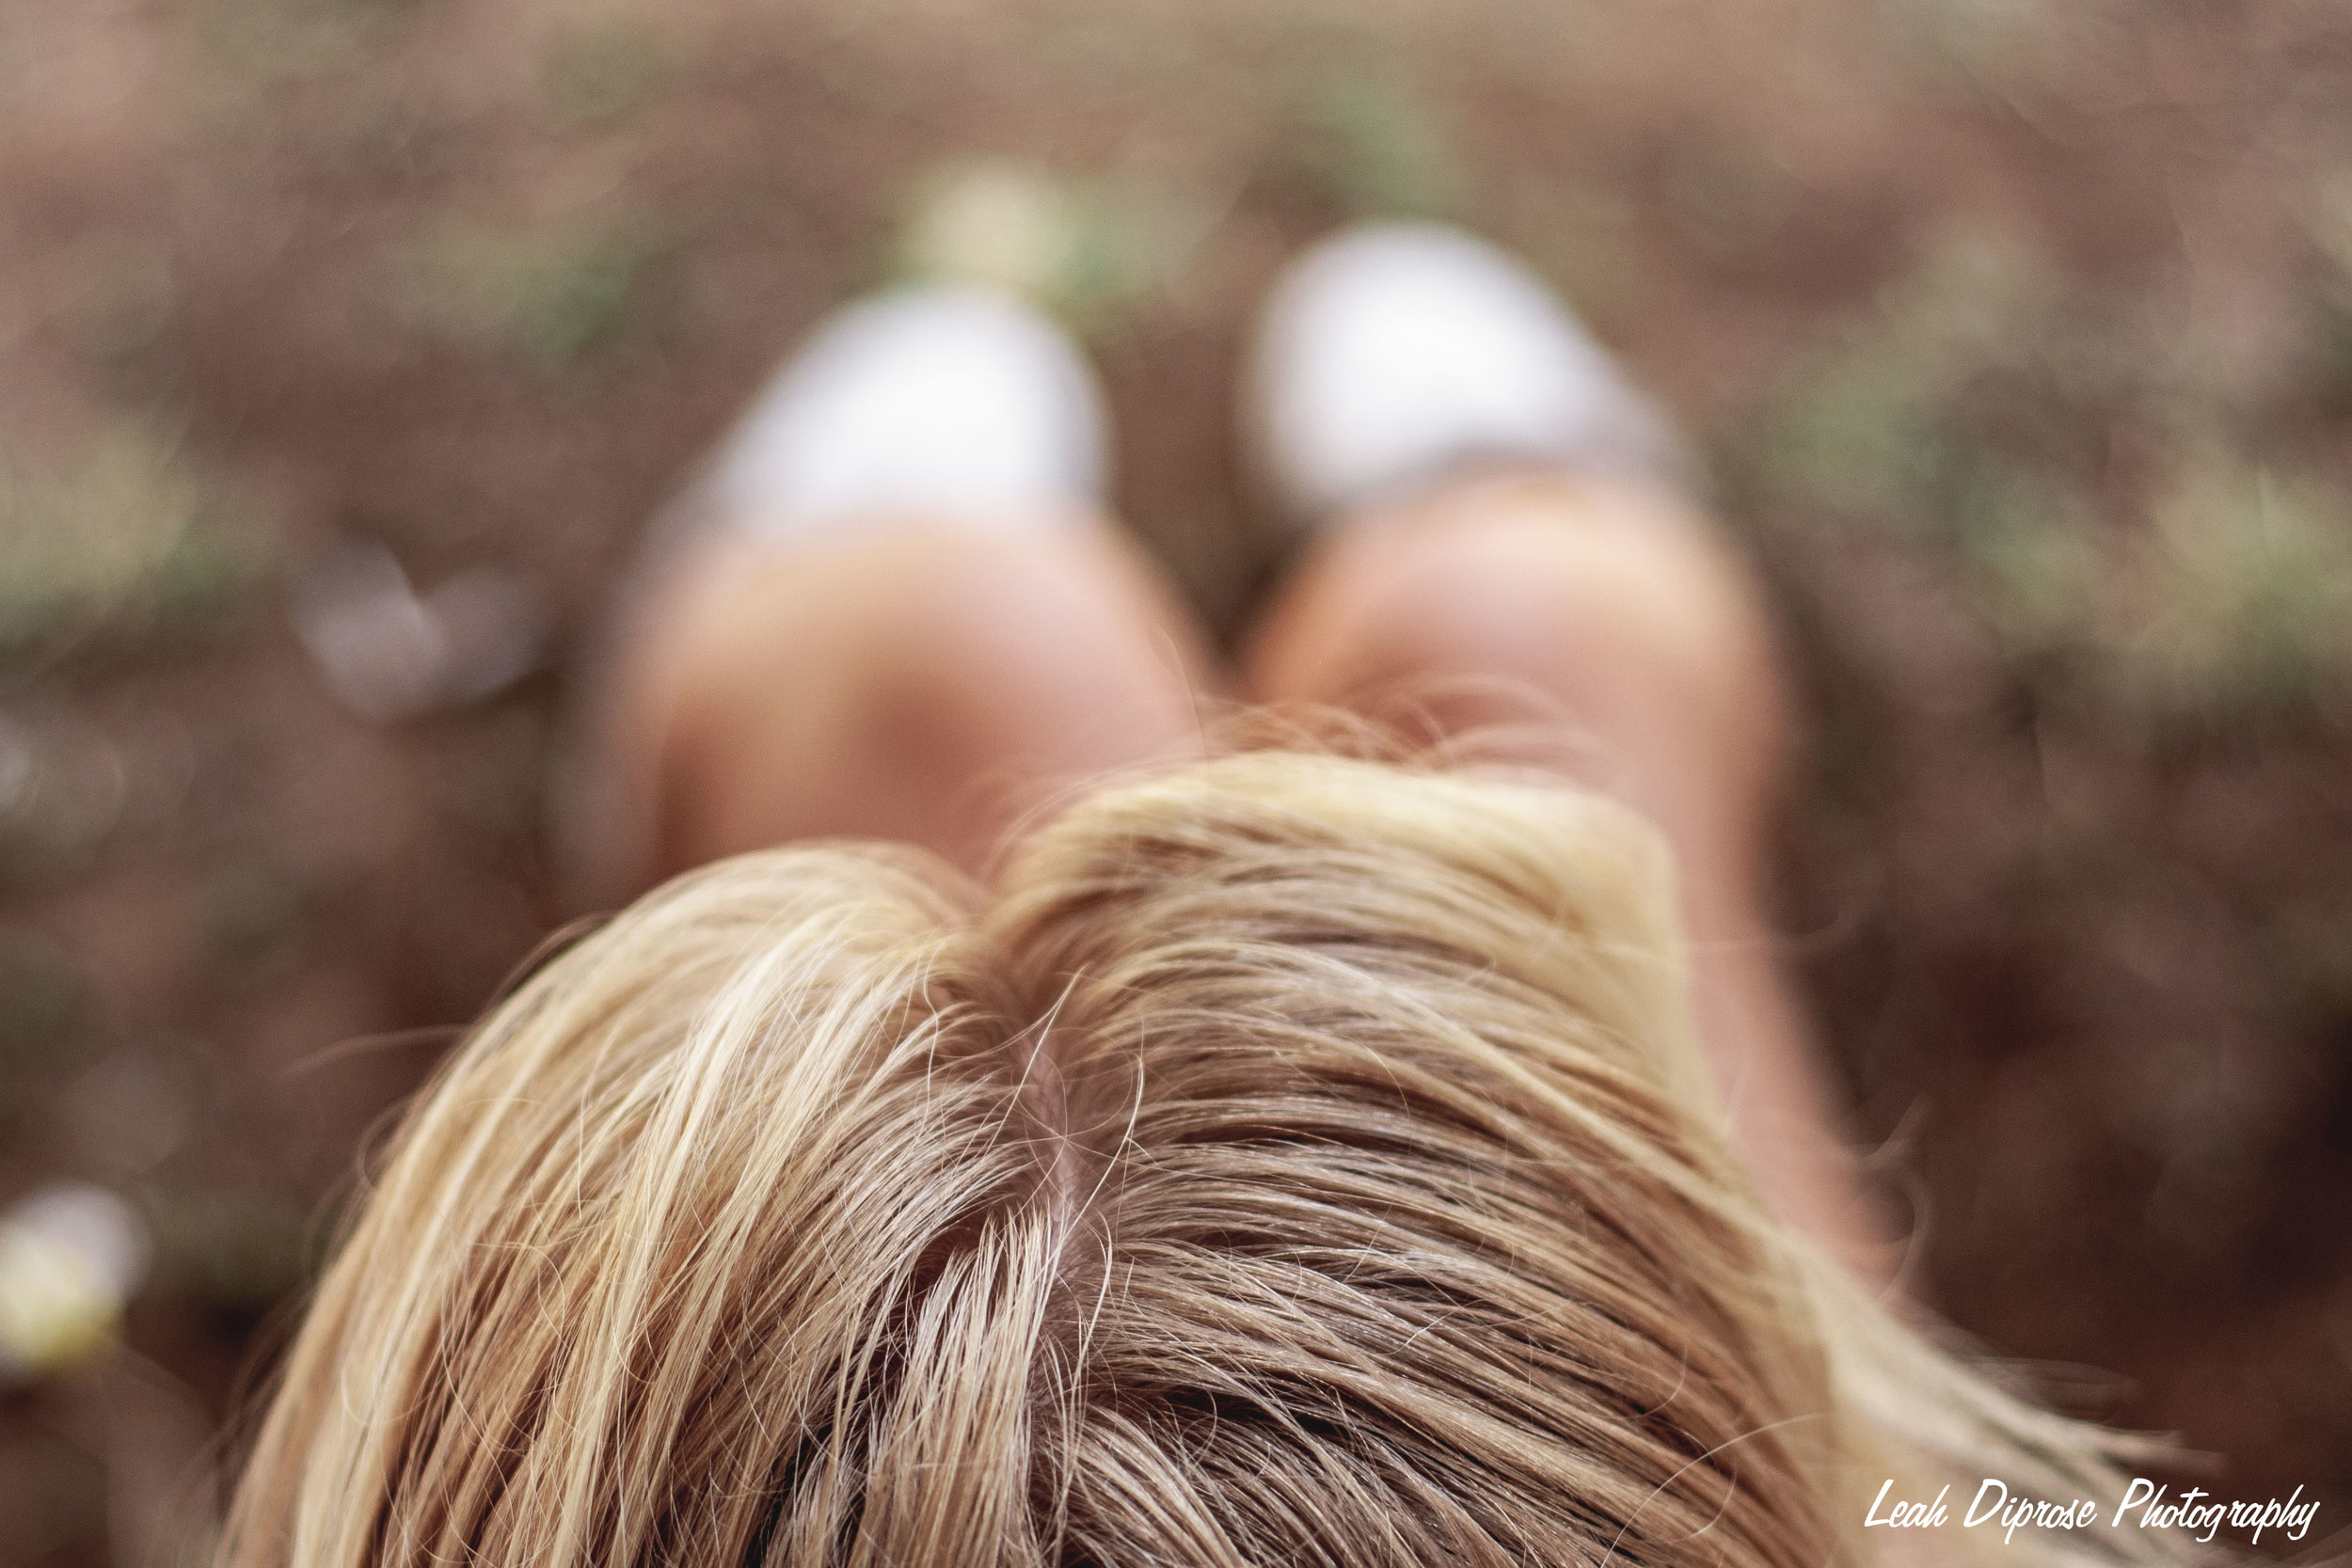 Leah Diprose Photography image-6420.jpg